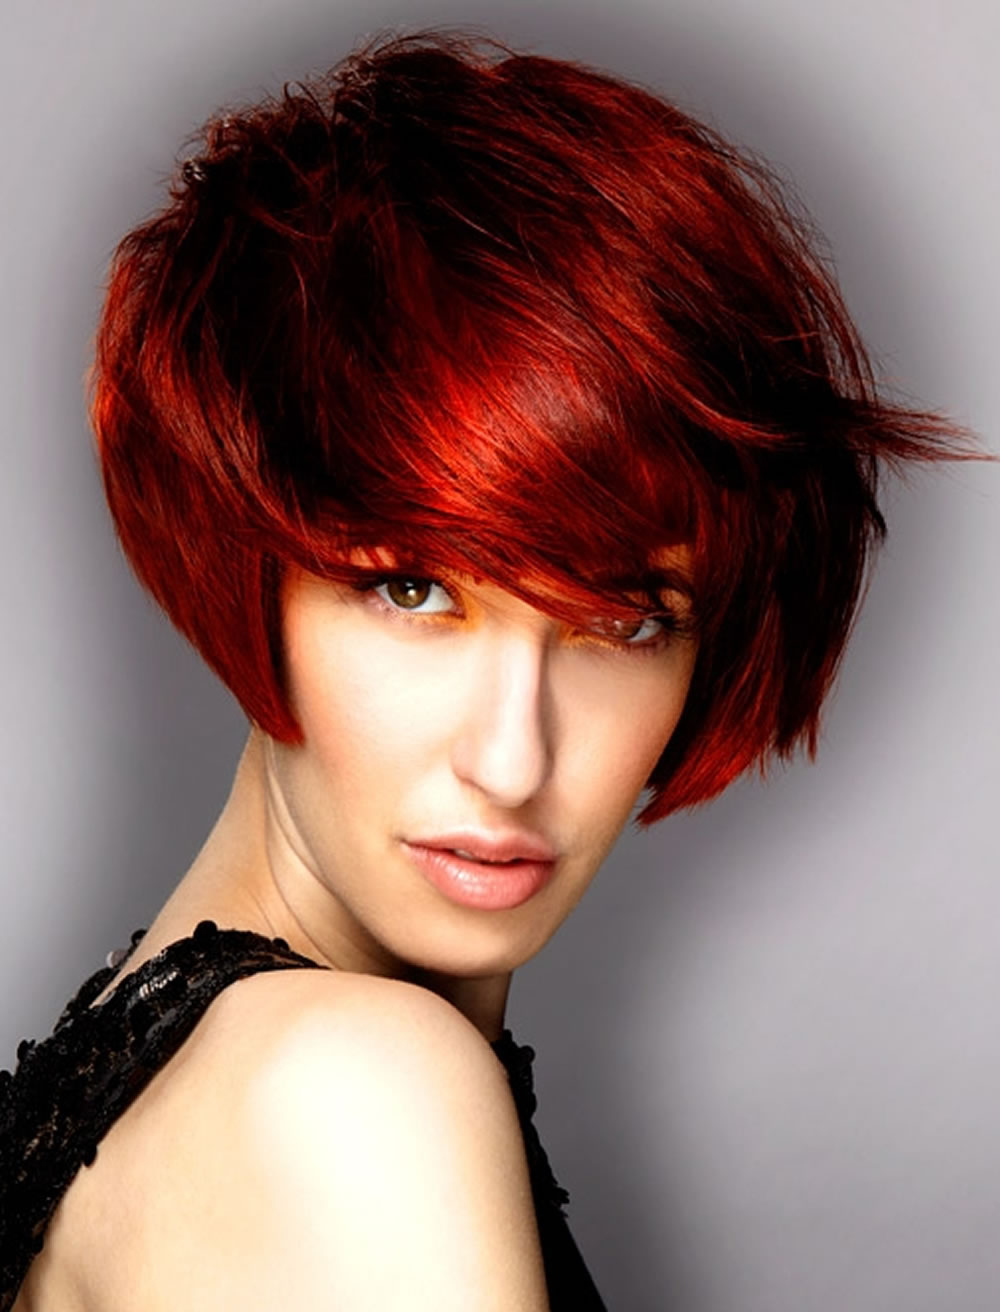 Incredible Short Bob Hairstyles Red Hair 2017 2018 – Hairstyles Regarding Short Hairstyles For Red Hair (View 5 of 25)